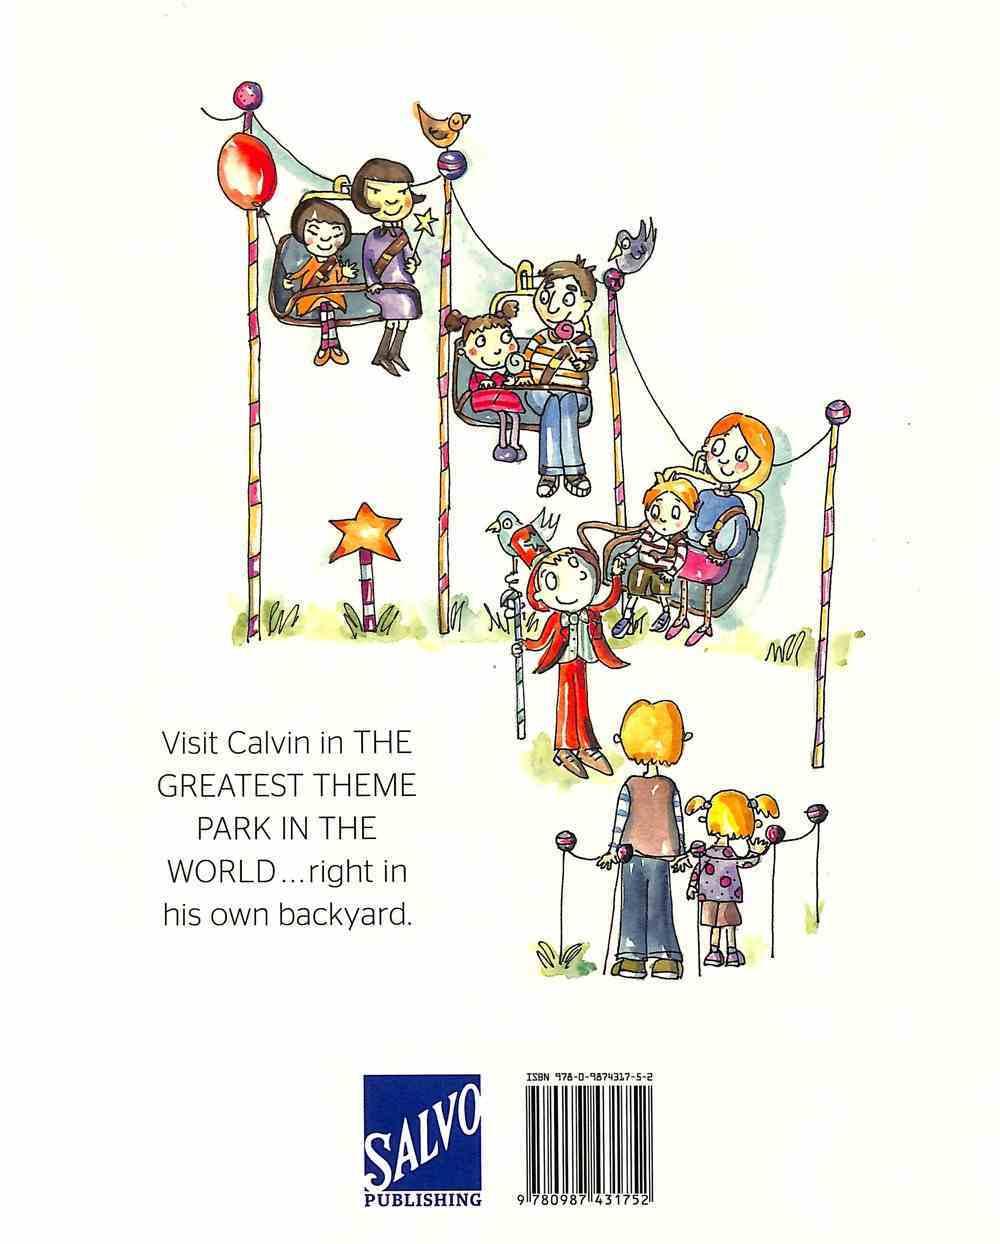 My Backyard Theme Park Paperback